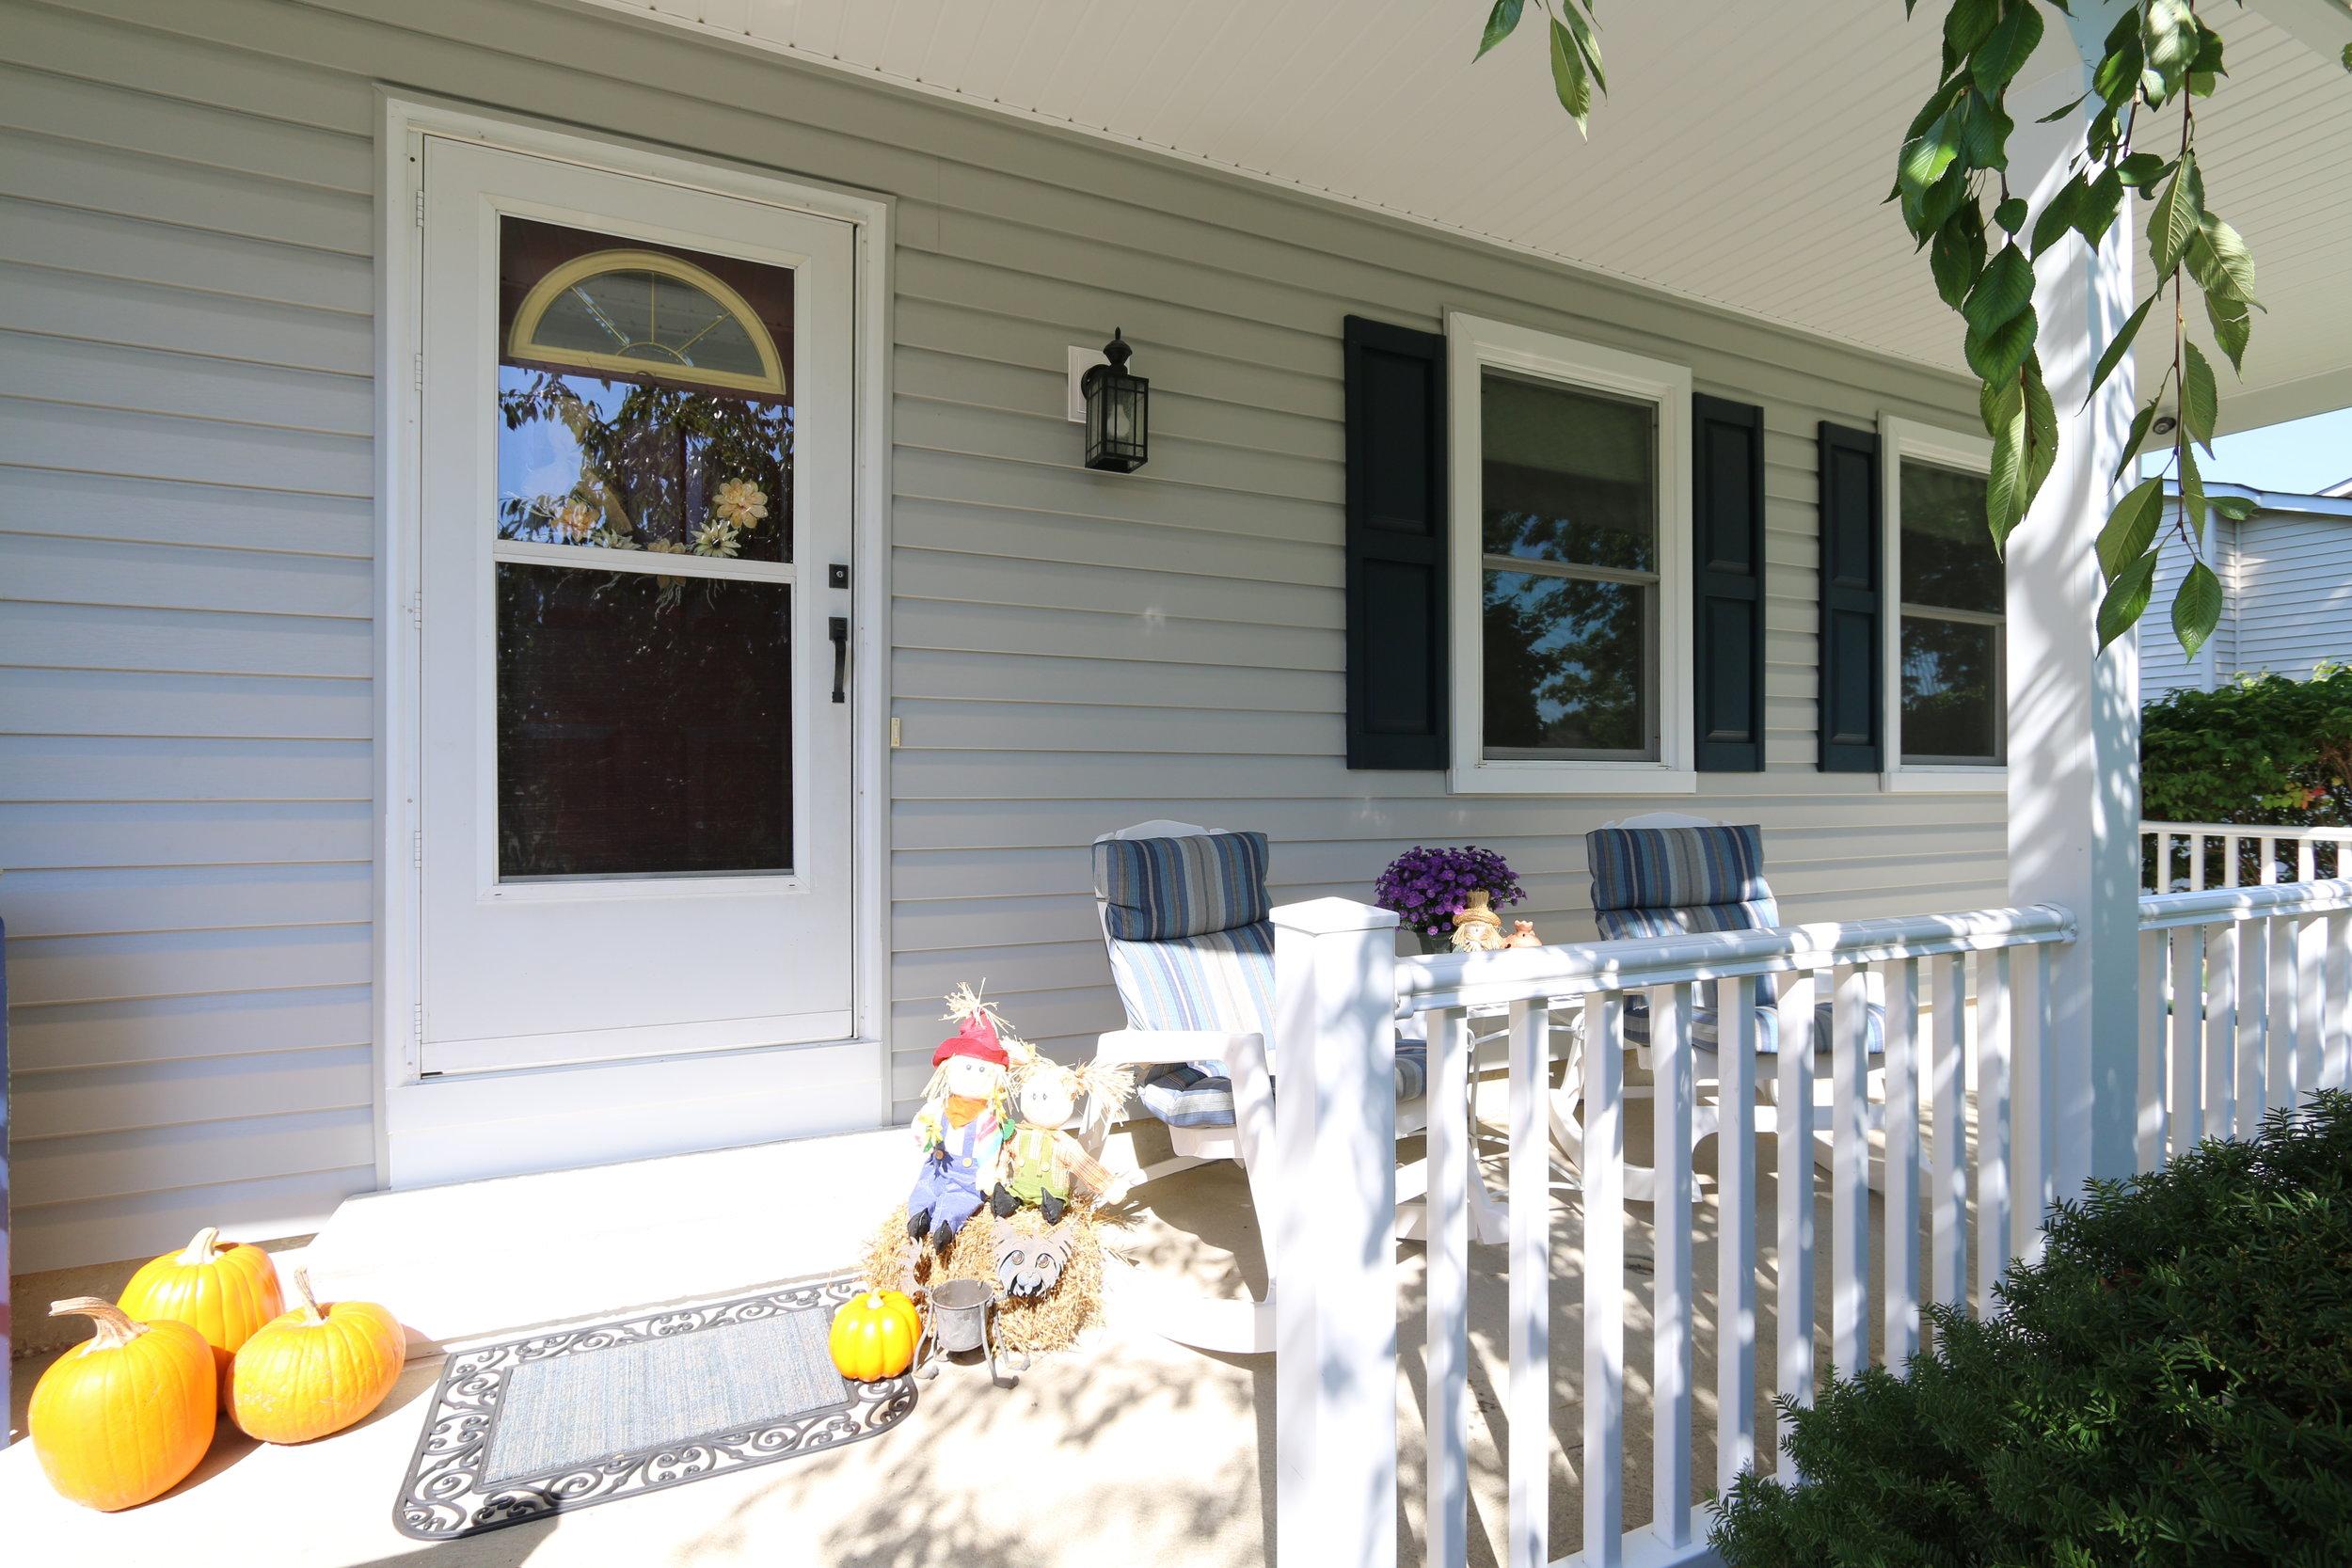 Home Siding, Vinyl Siding, Siding Replacement Milwaukee WI